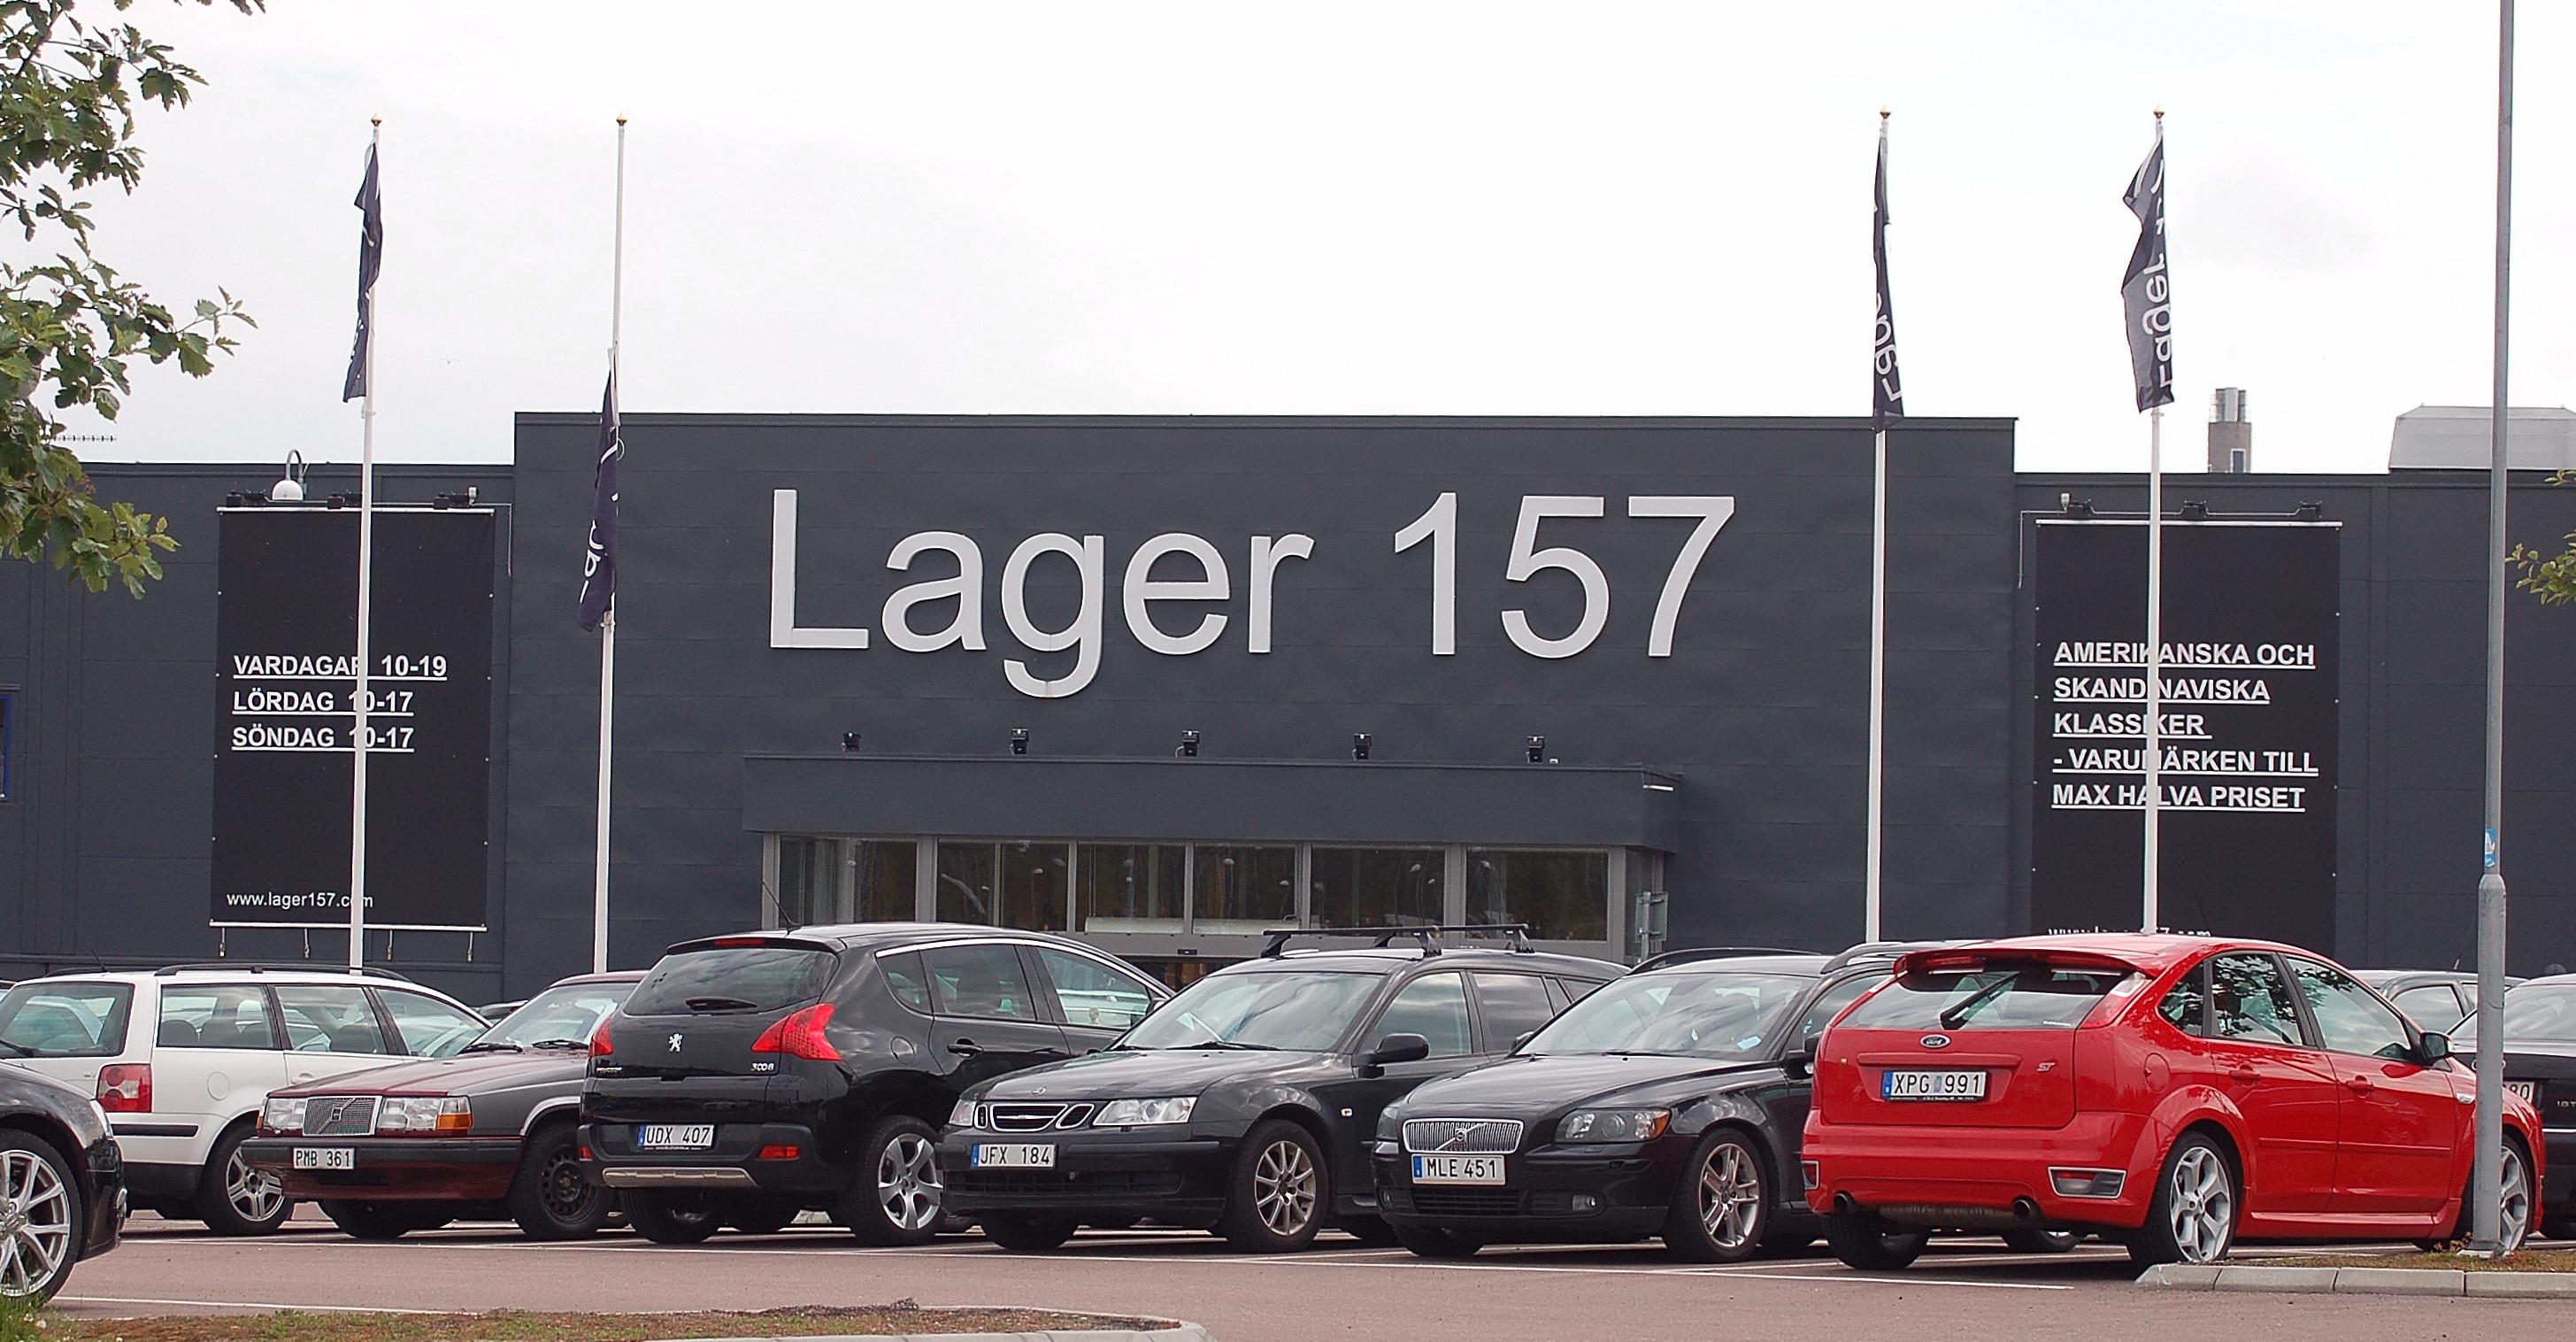 lager 157 norrköping öppettider